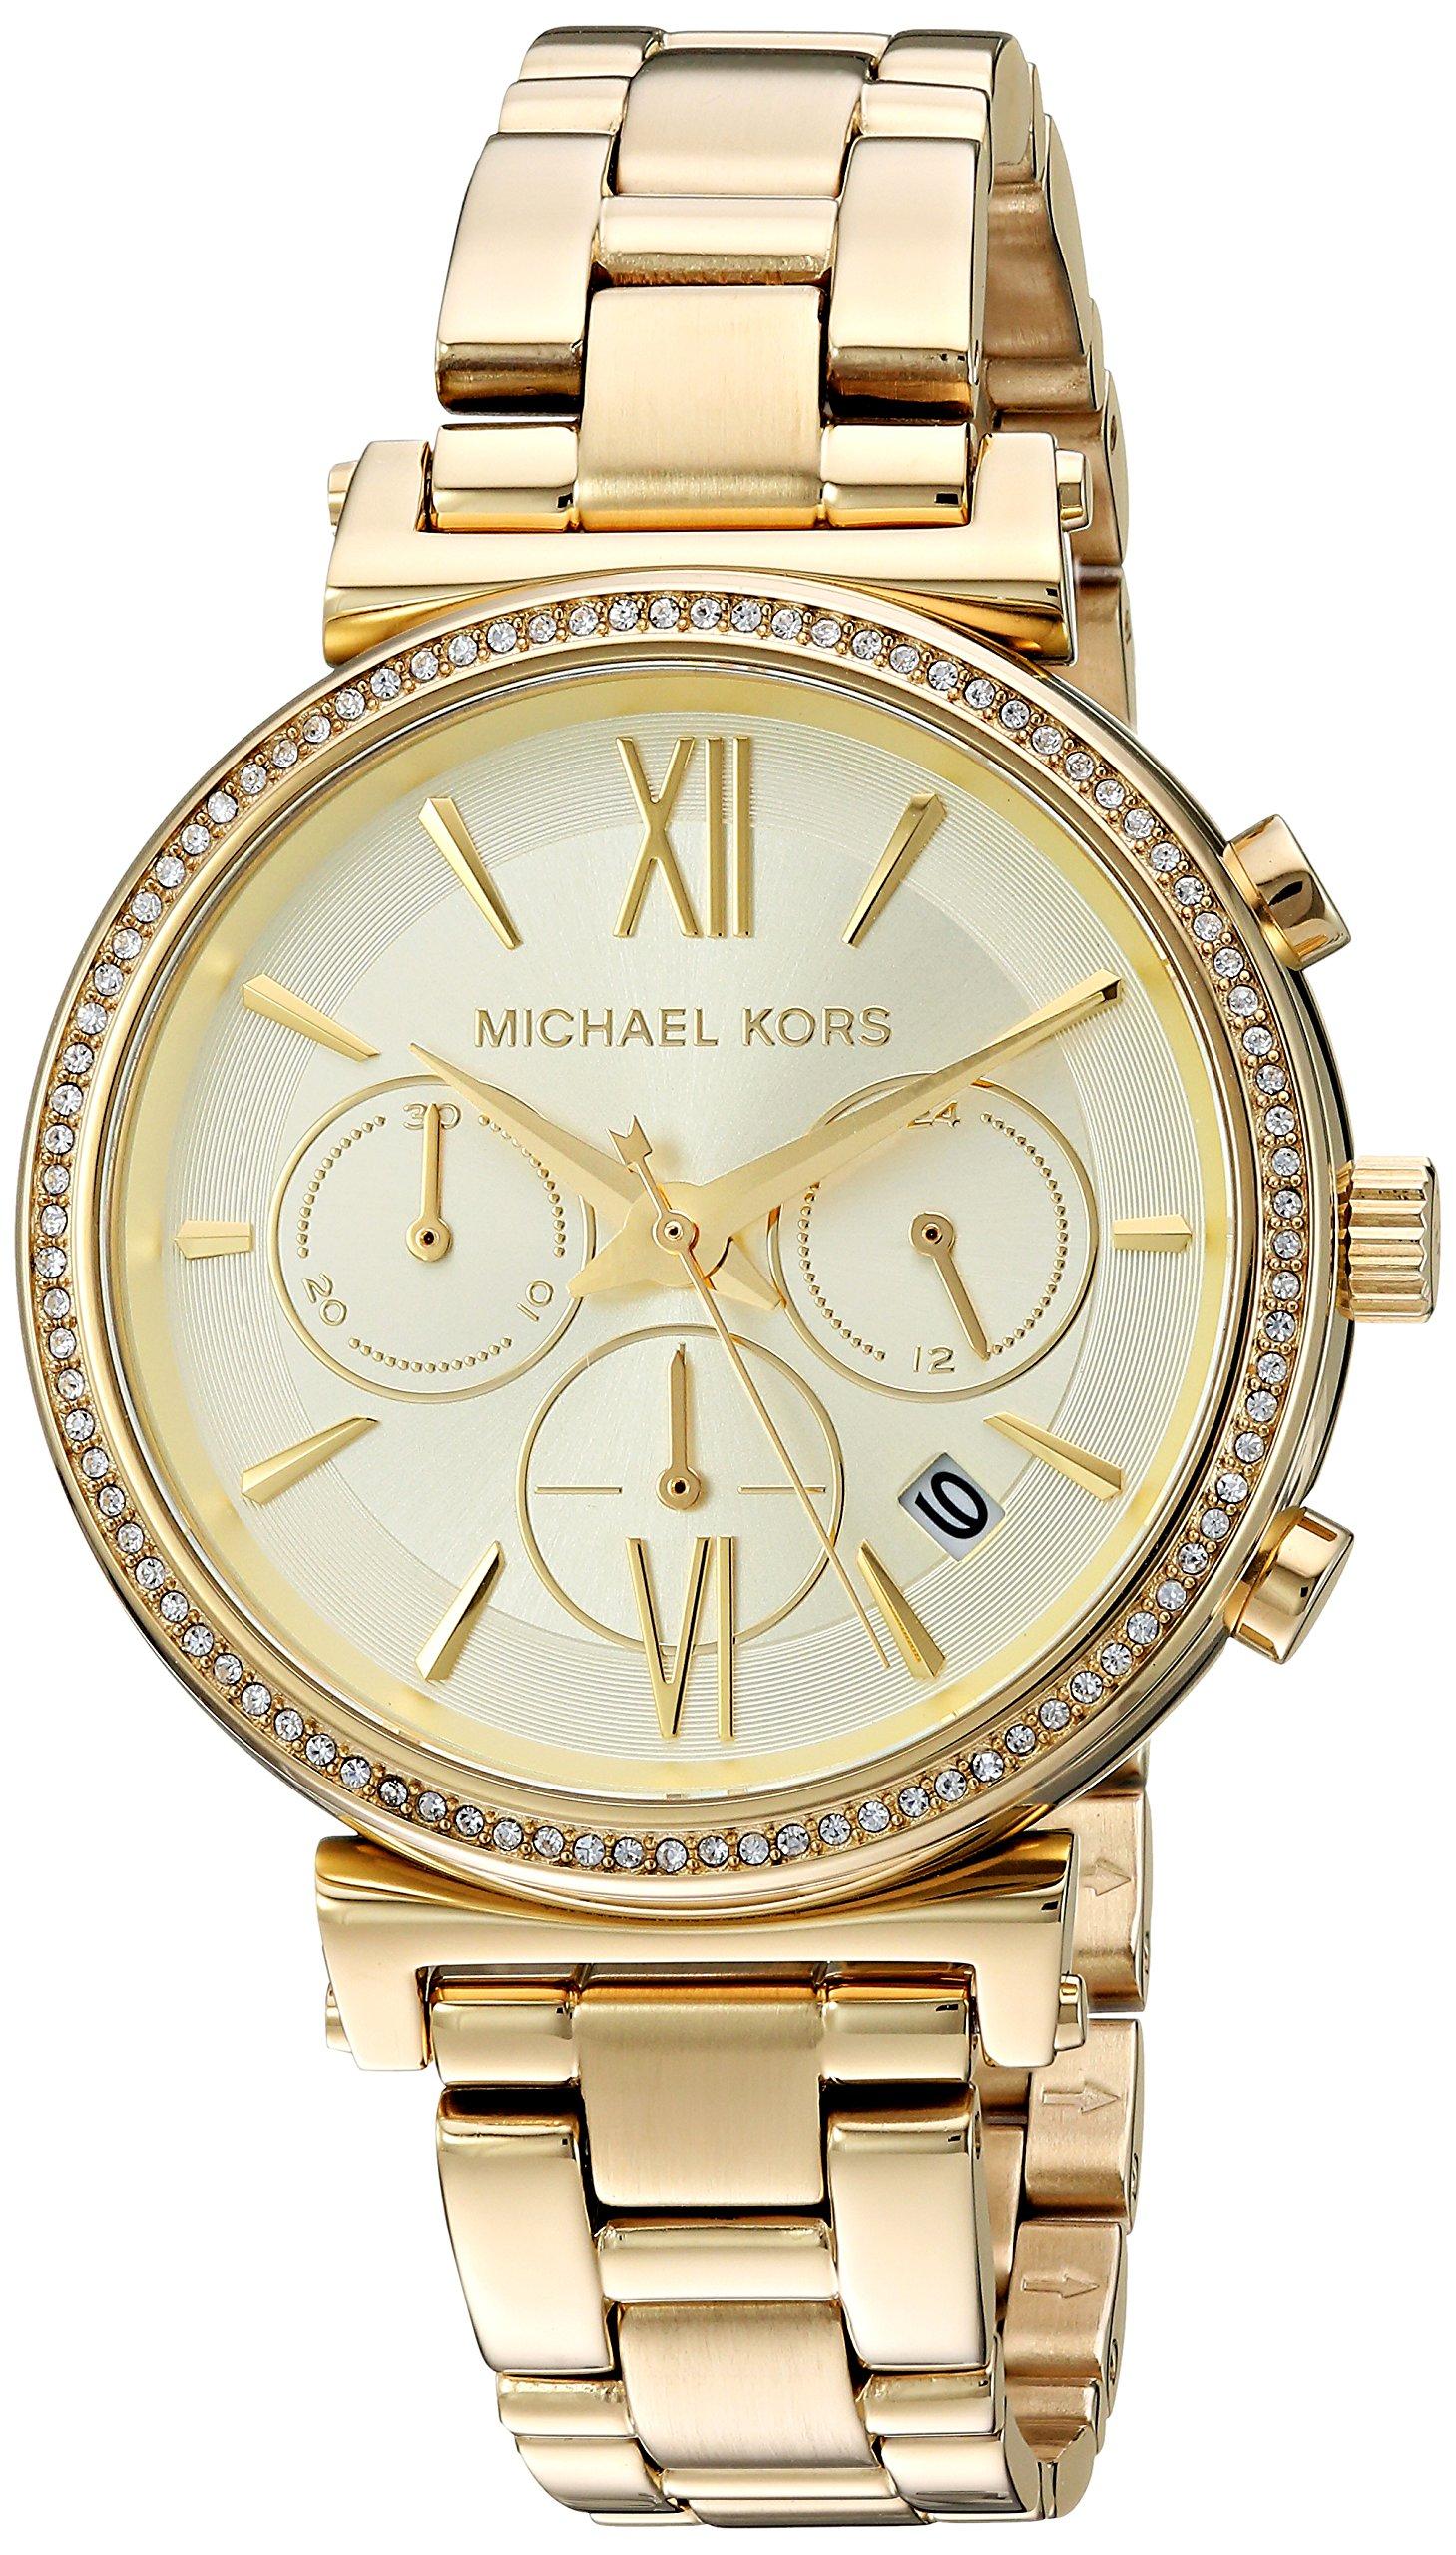 Michael Kors Women's Sofie Analog Display Analog Quartz Gold Watch MK6559